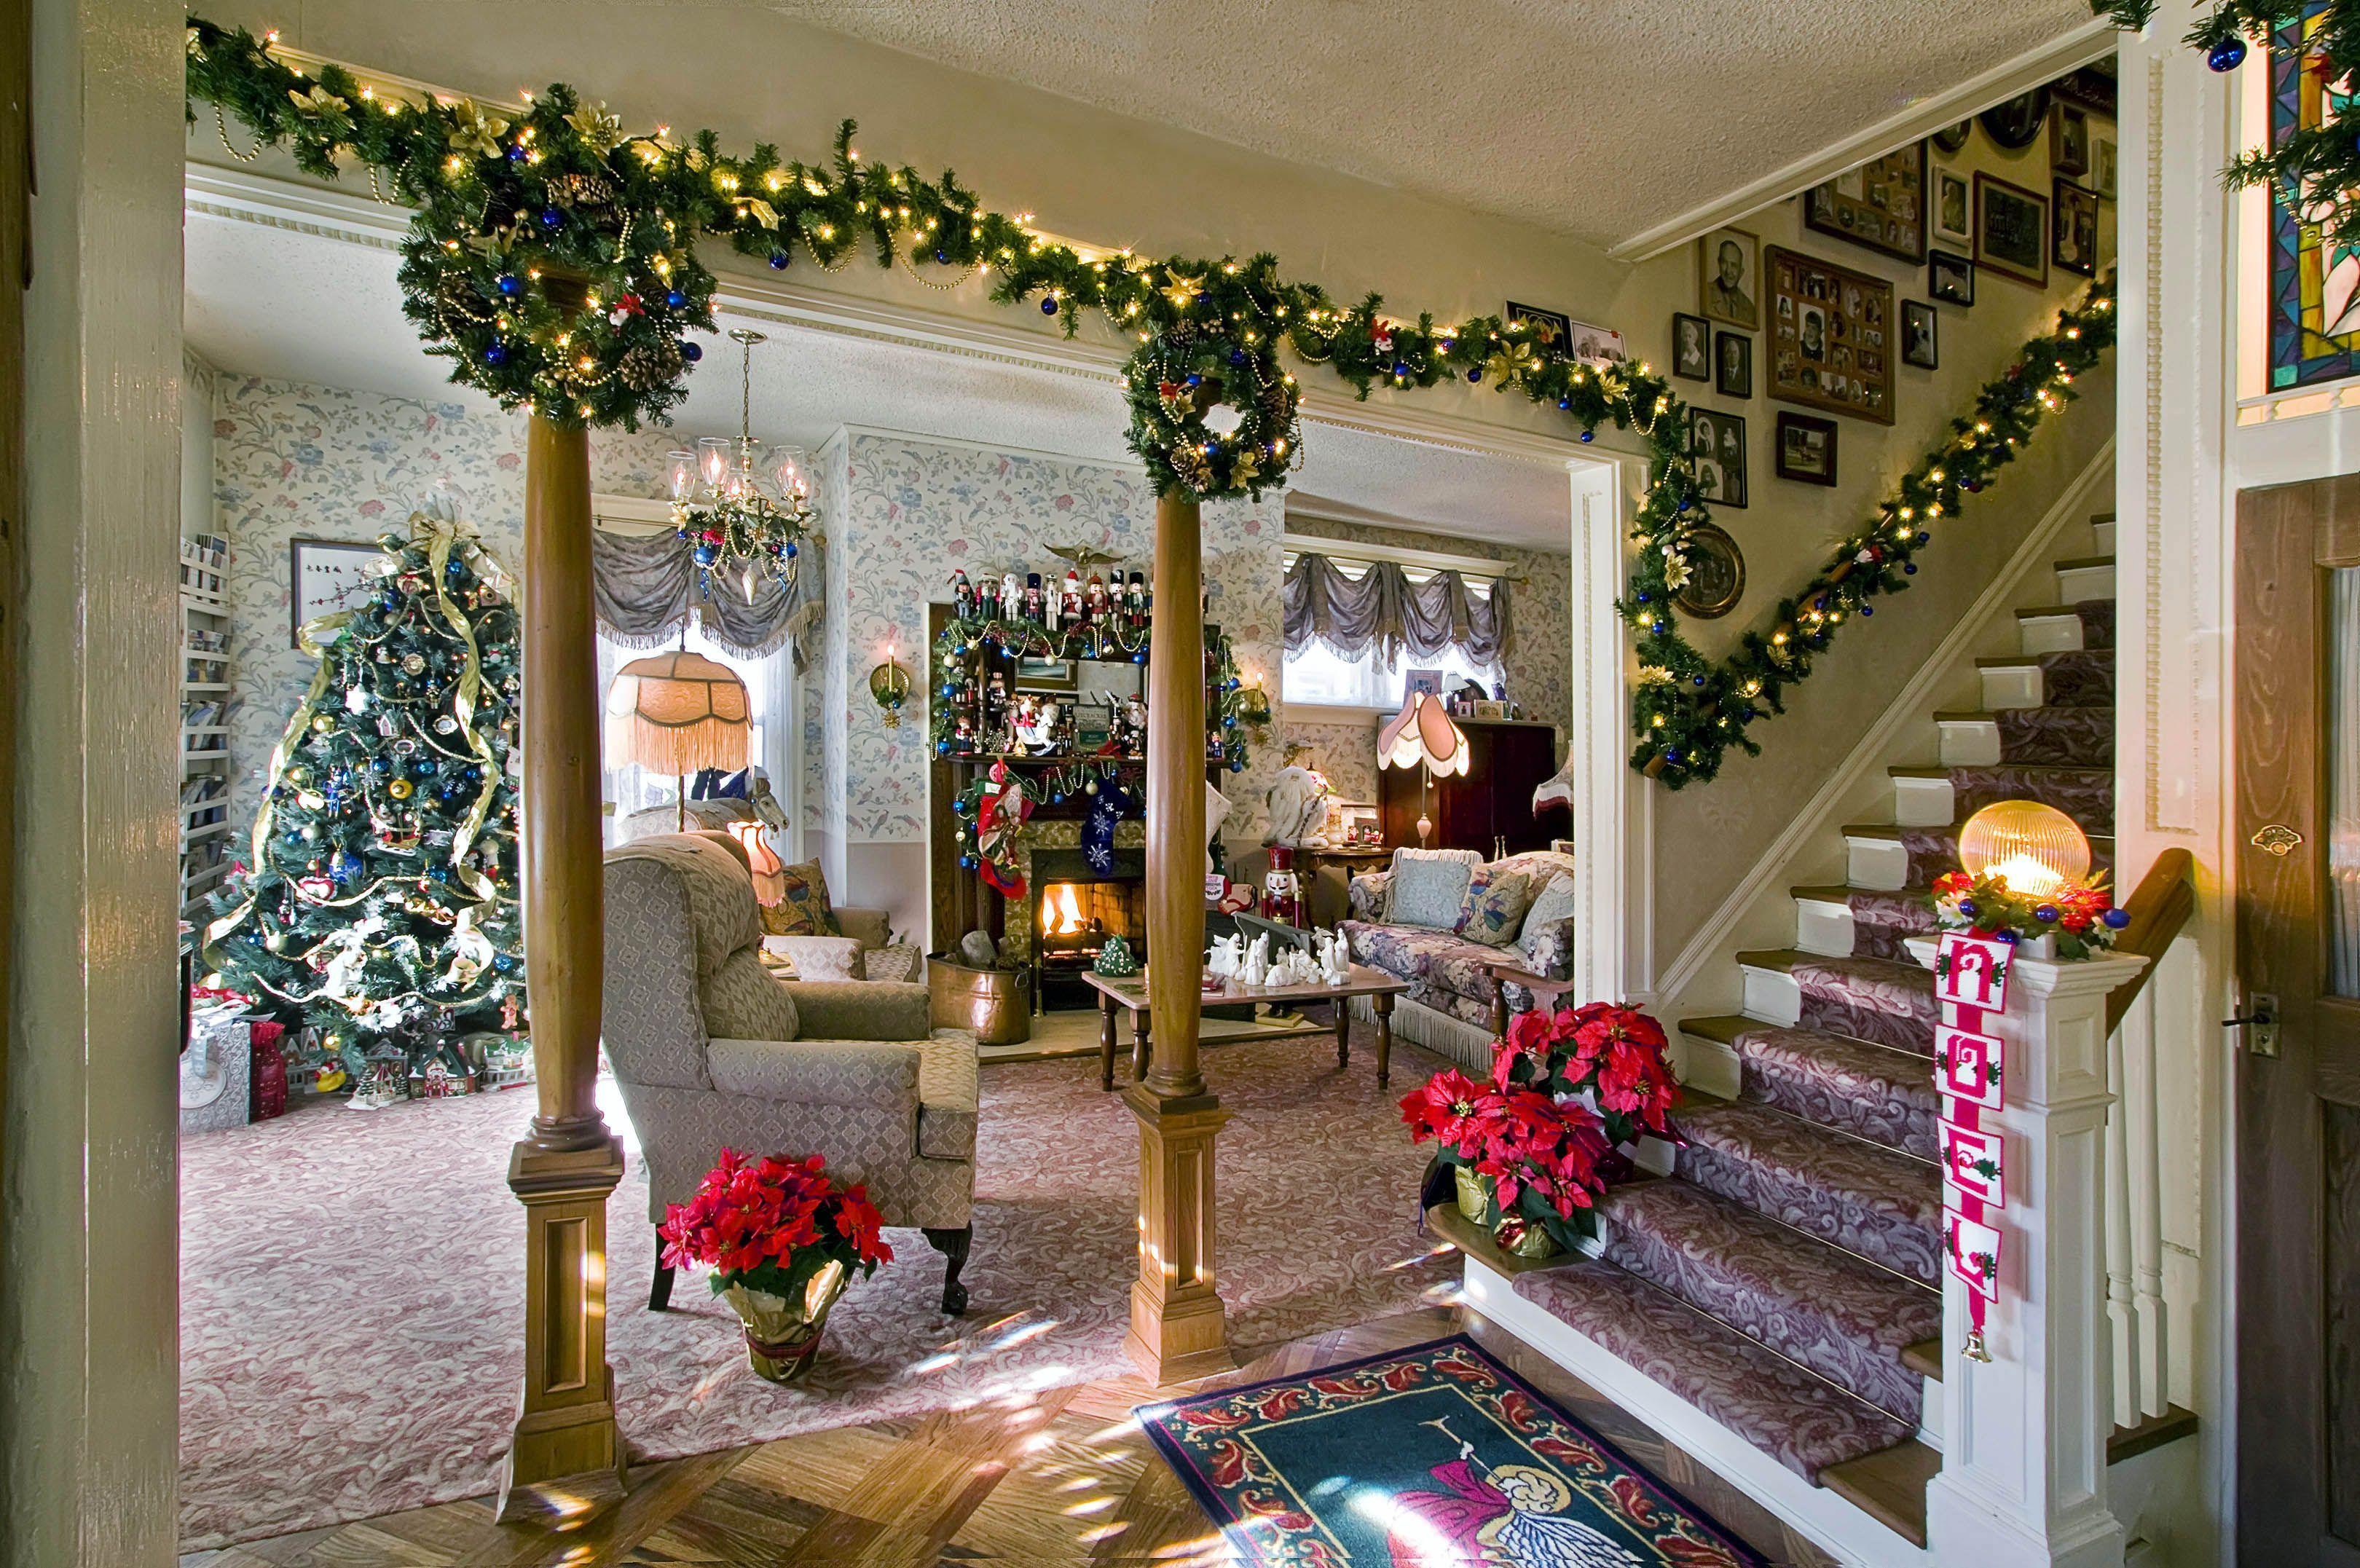 Interior Doors Comforttable Beautiful Coloringroom Decorationideas Christmas Cozy Awesome Forearm Tattoo Forearmchristmas Elegant Living Setupdecorating